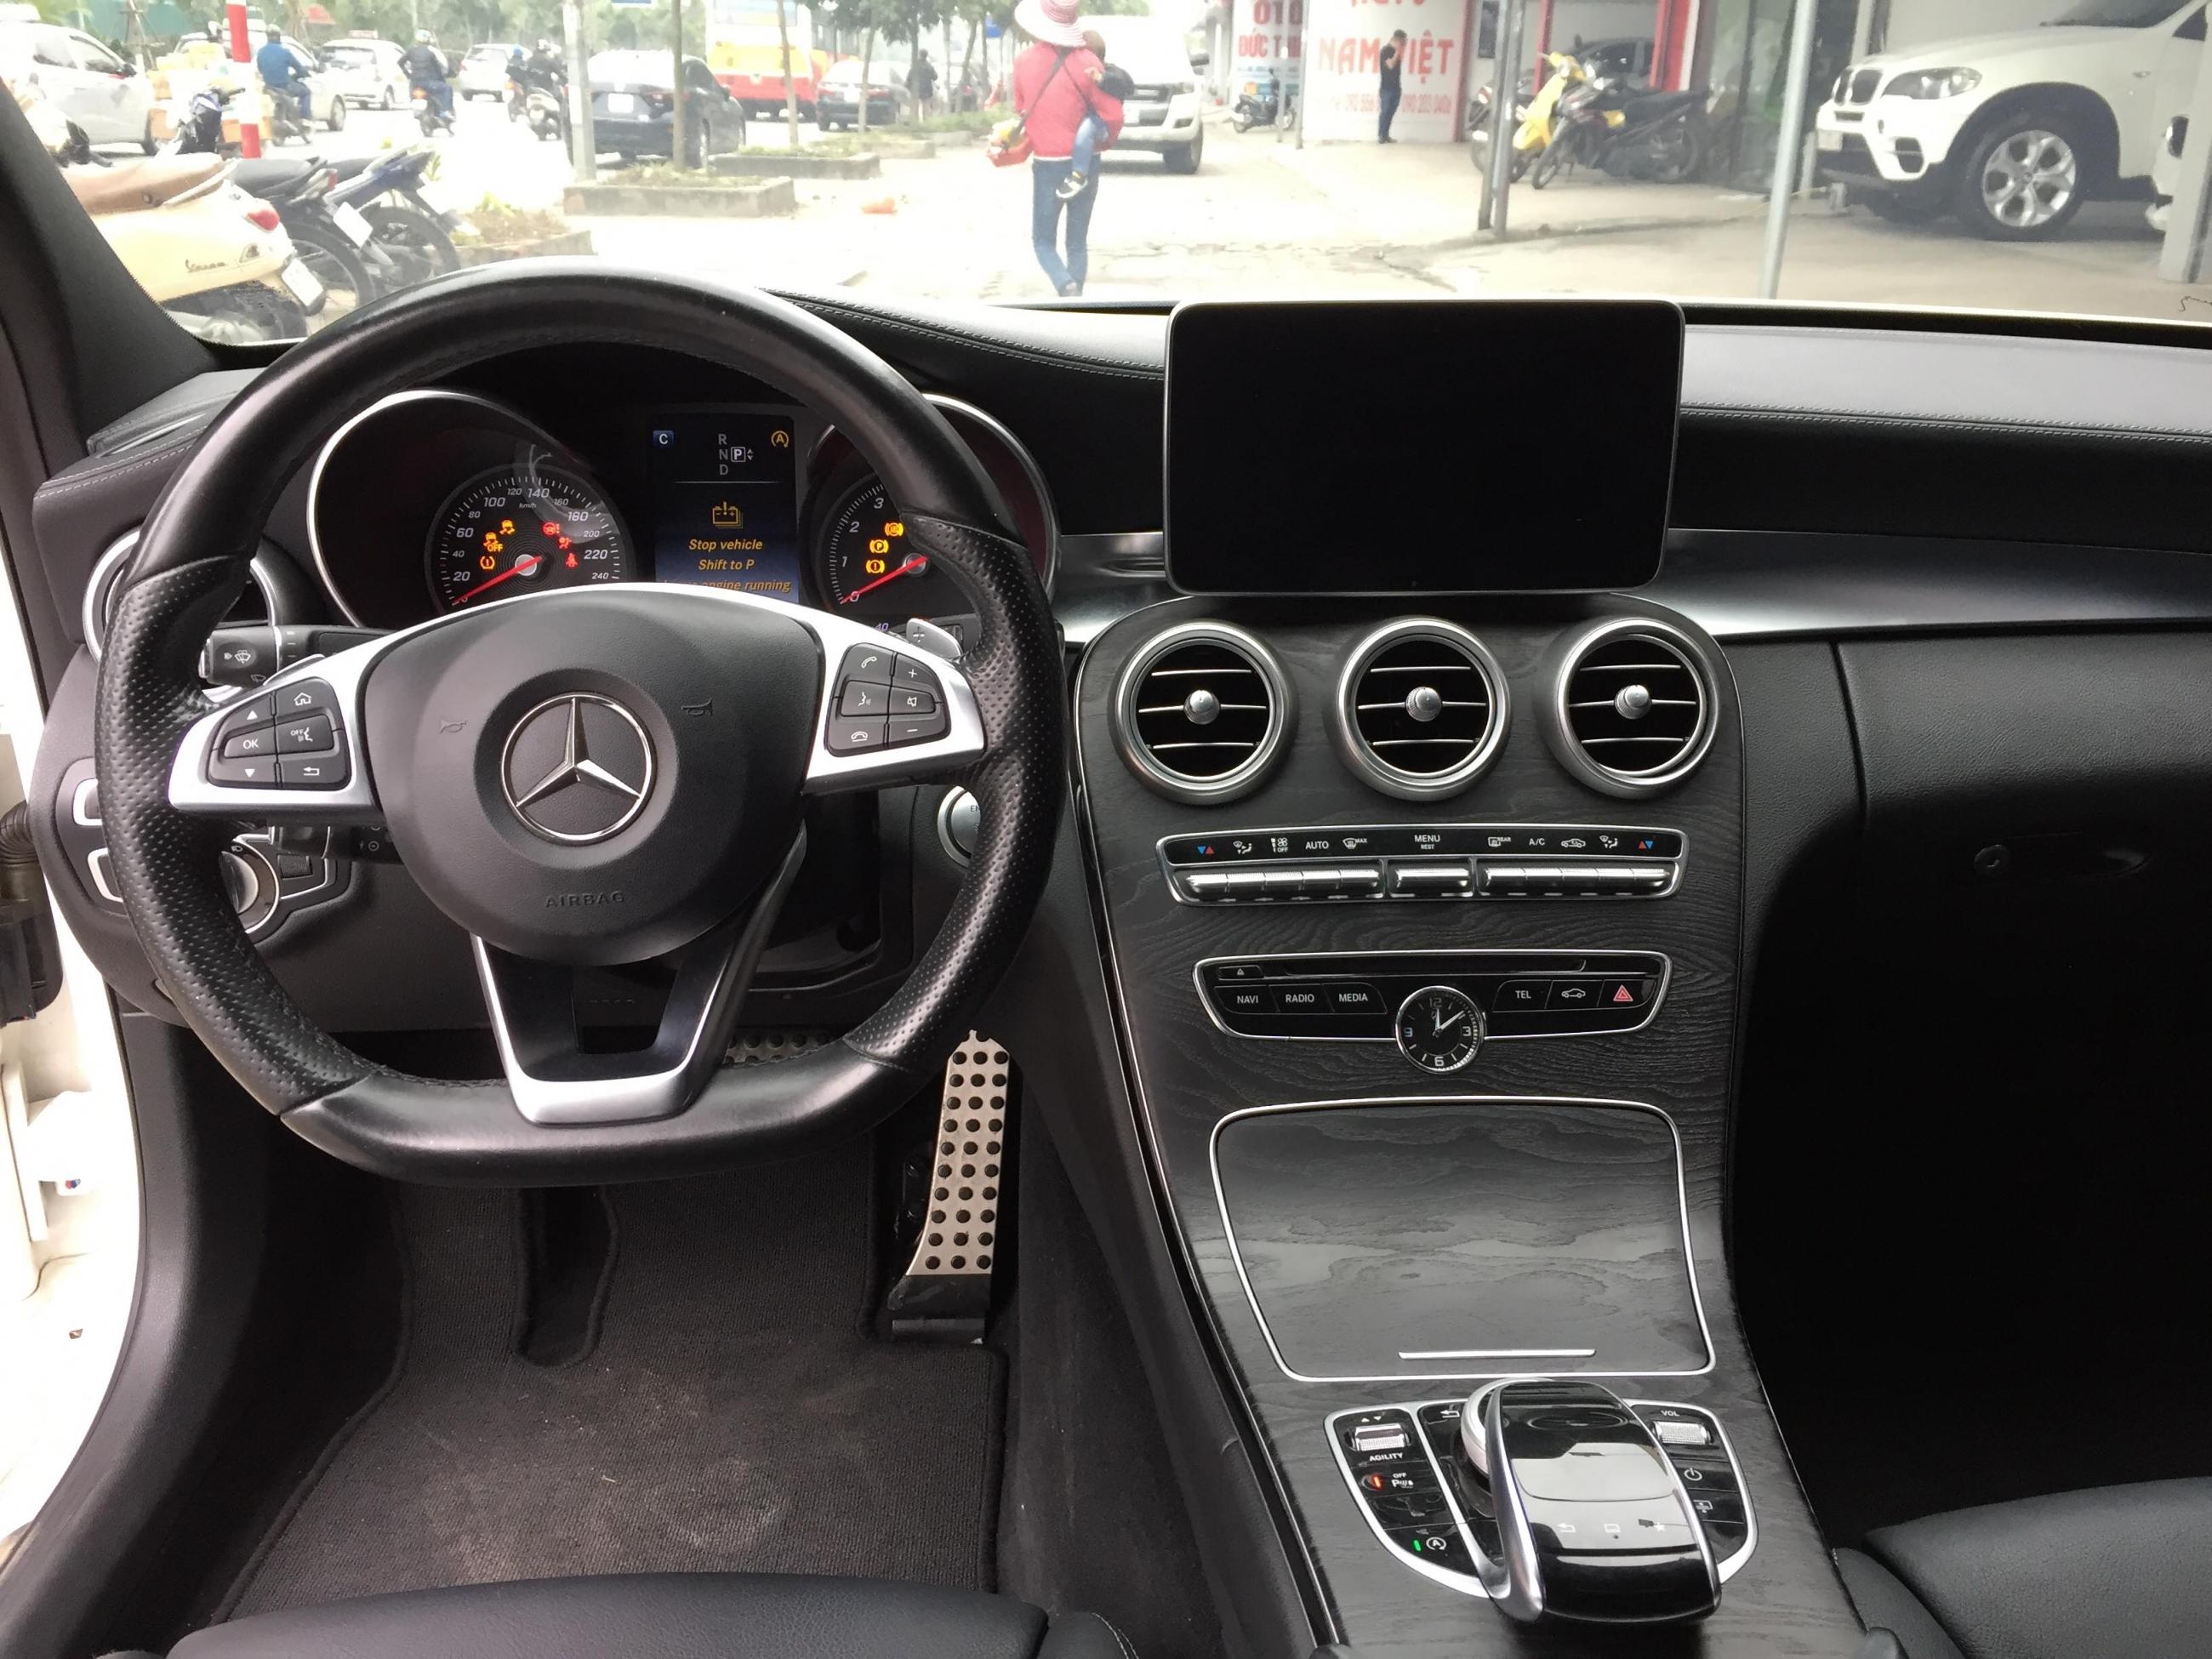 Mercedes Benz C250 AMG 2015 - 10